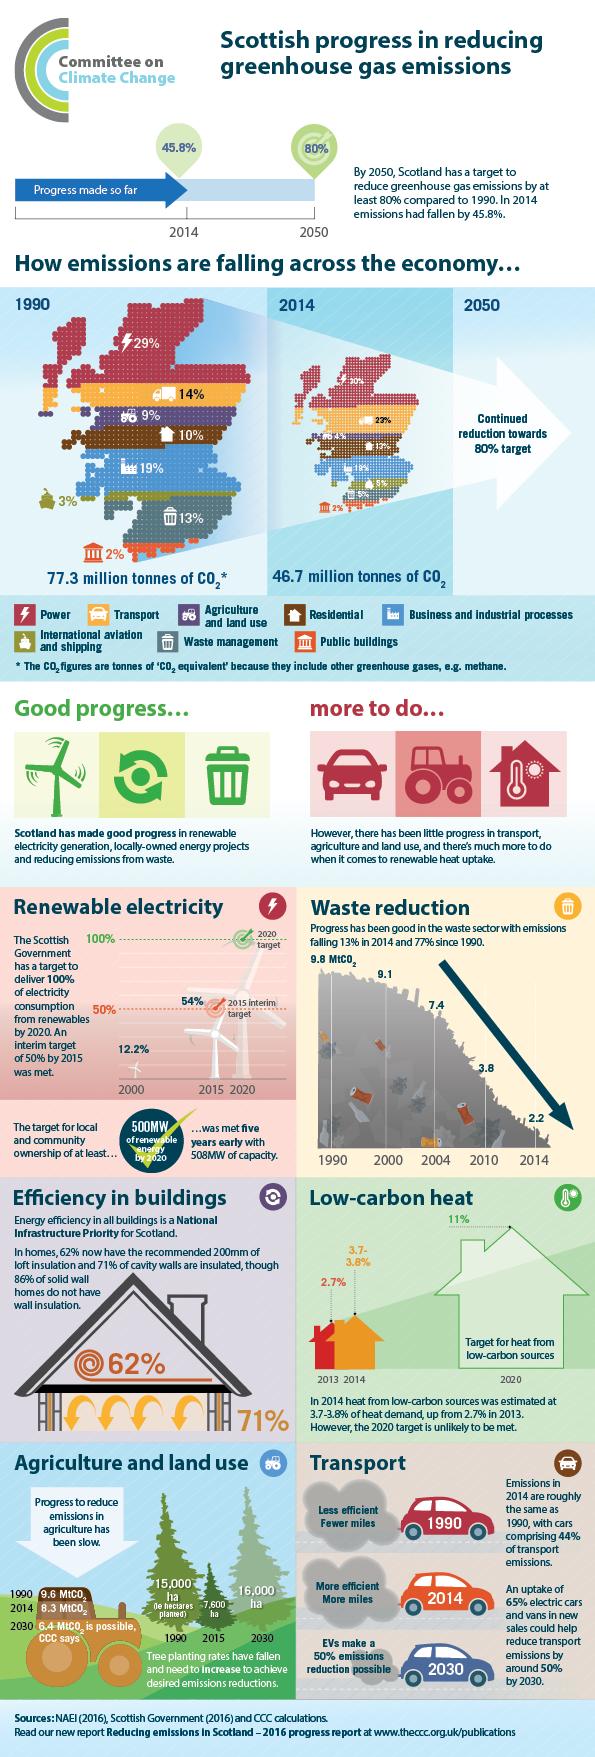 Progress in reducing emissions in Scotland 2016